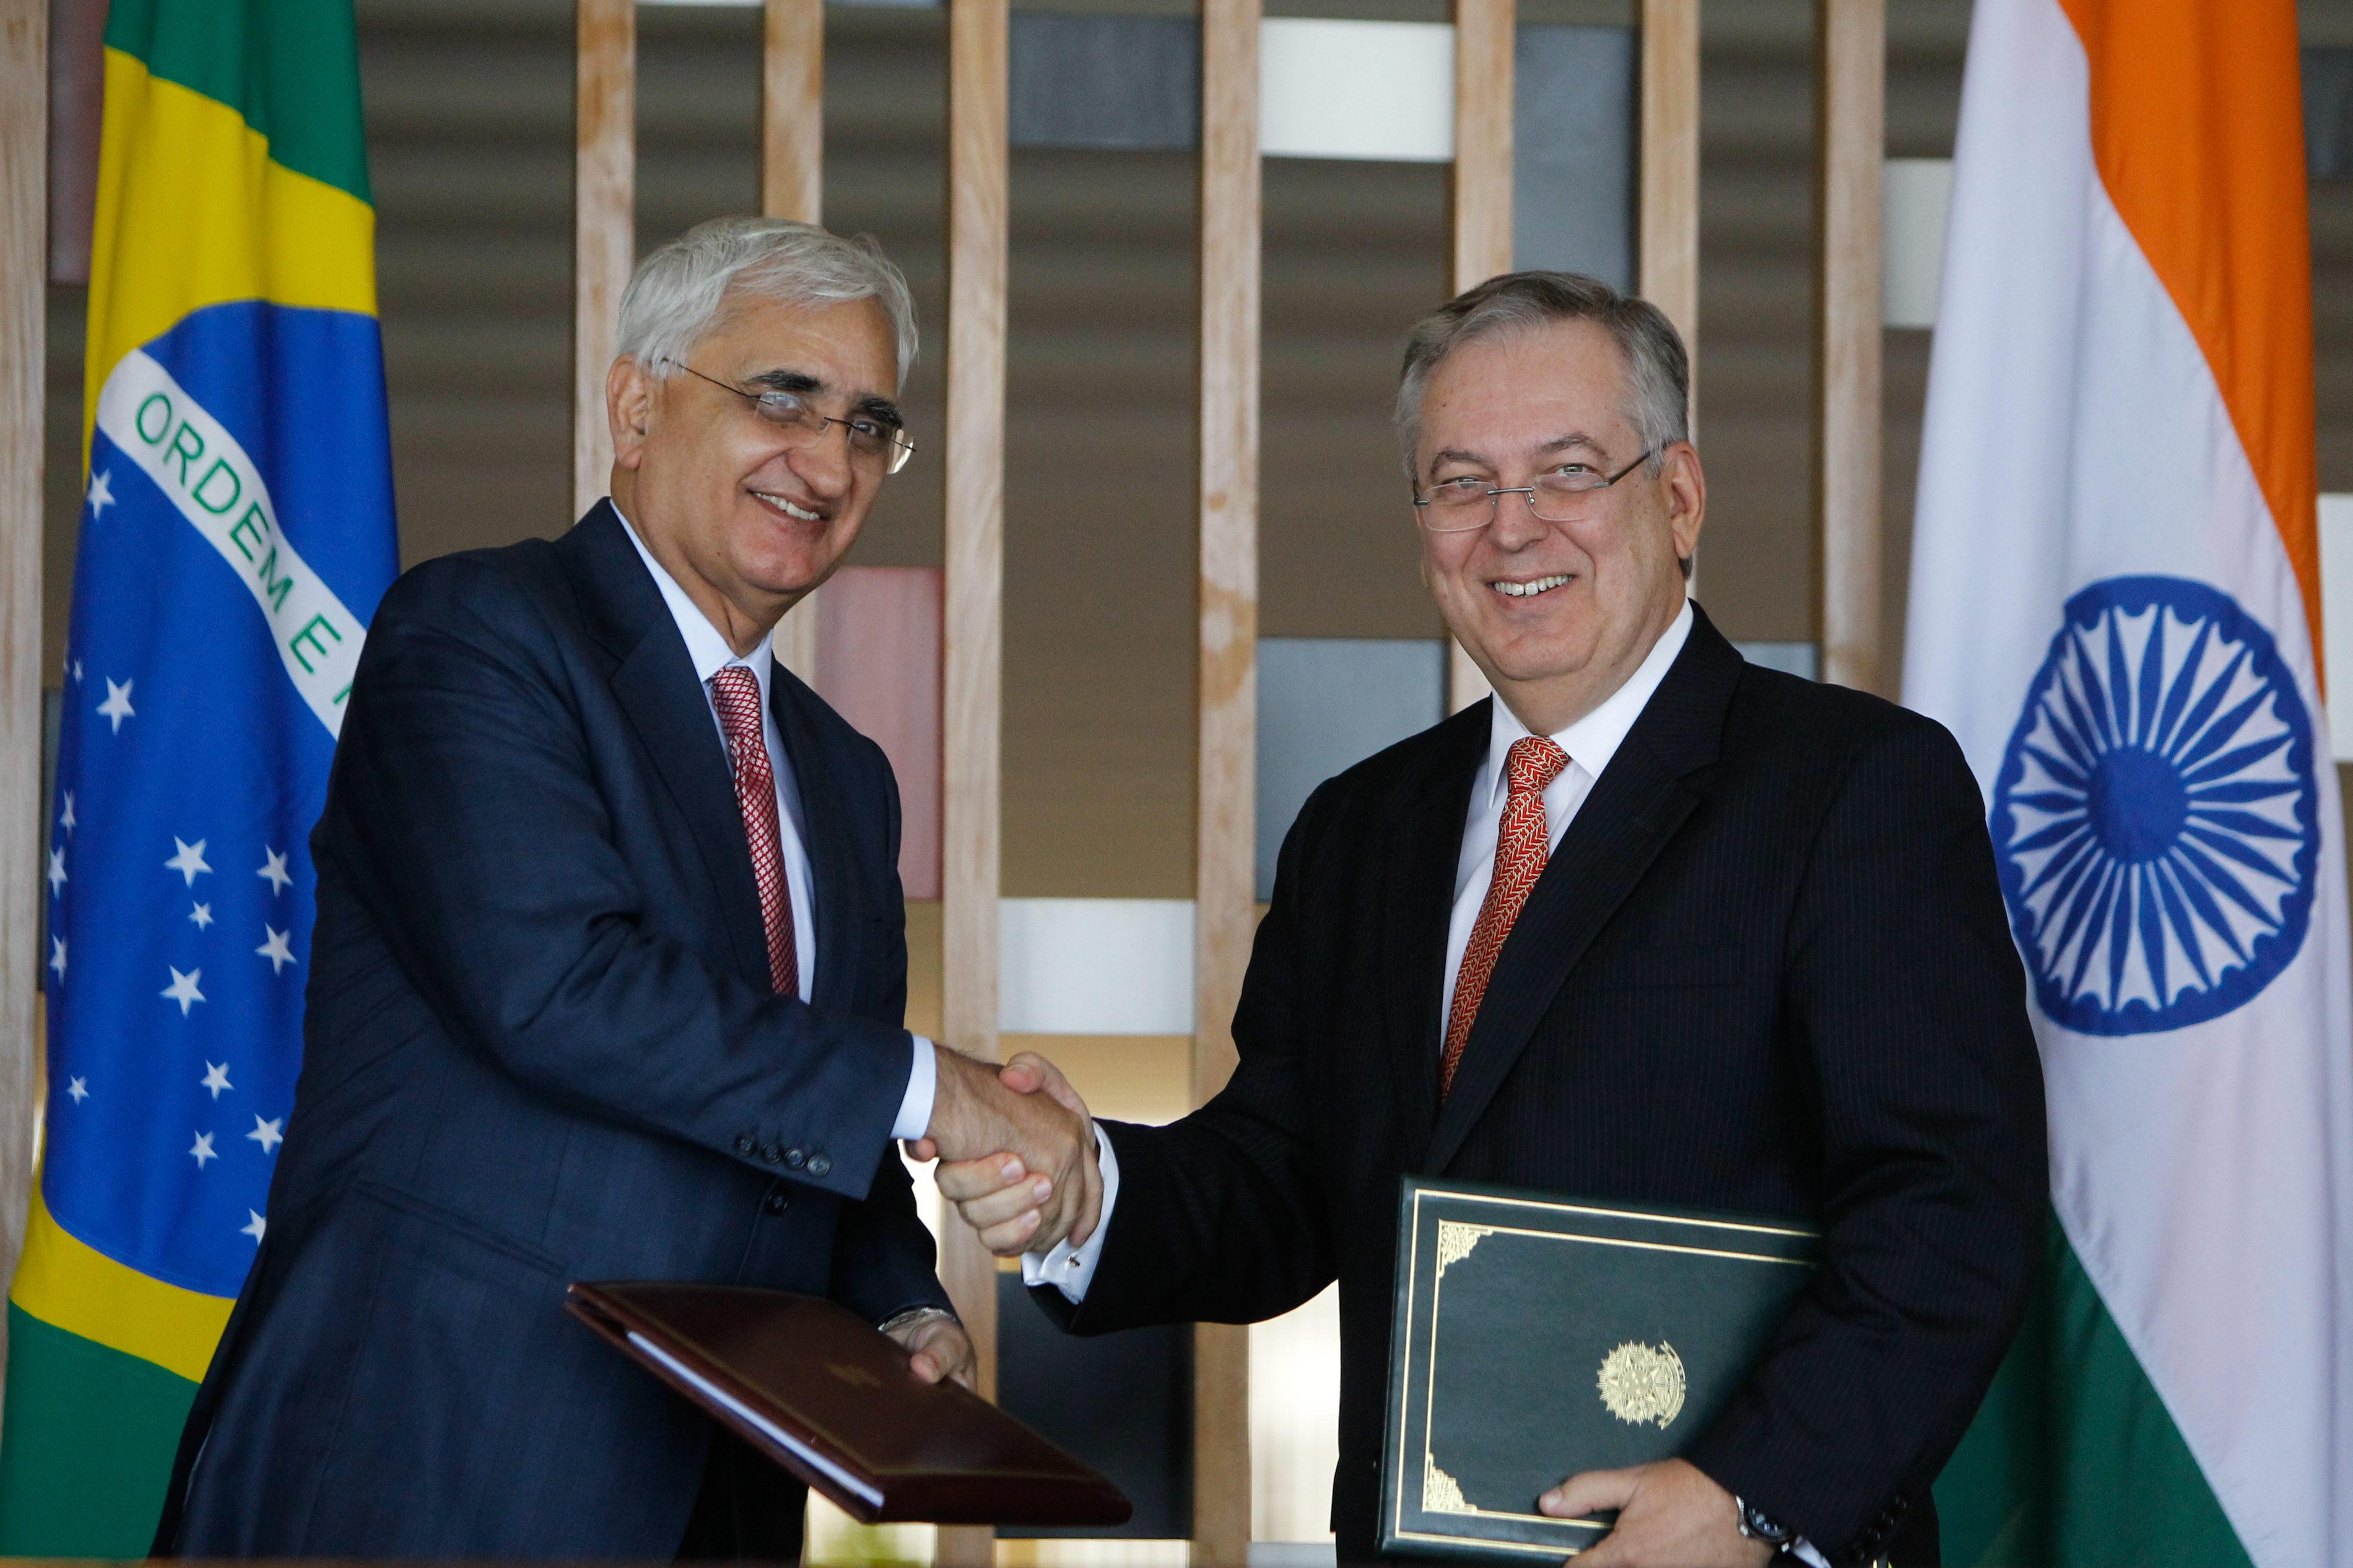 Brasil e India ratifican la meta comercial de 15.000 millones de dólares en 2015